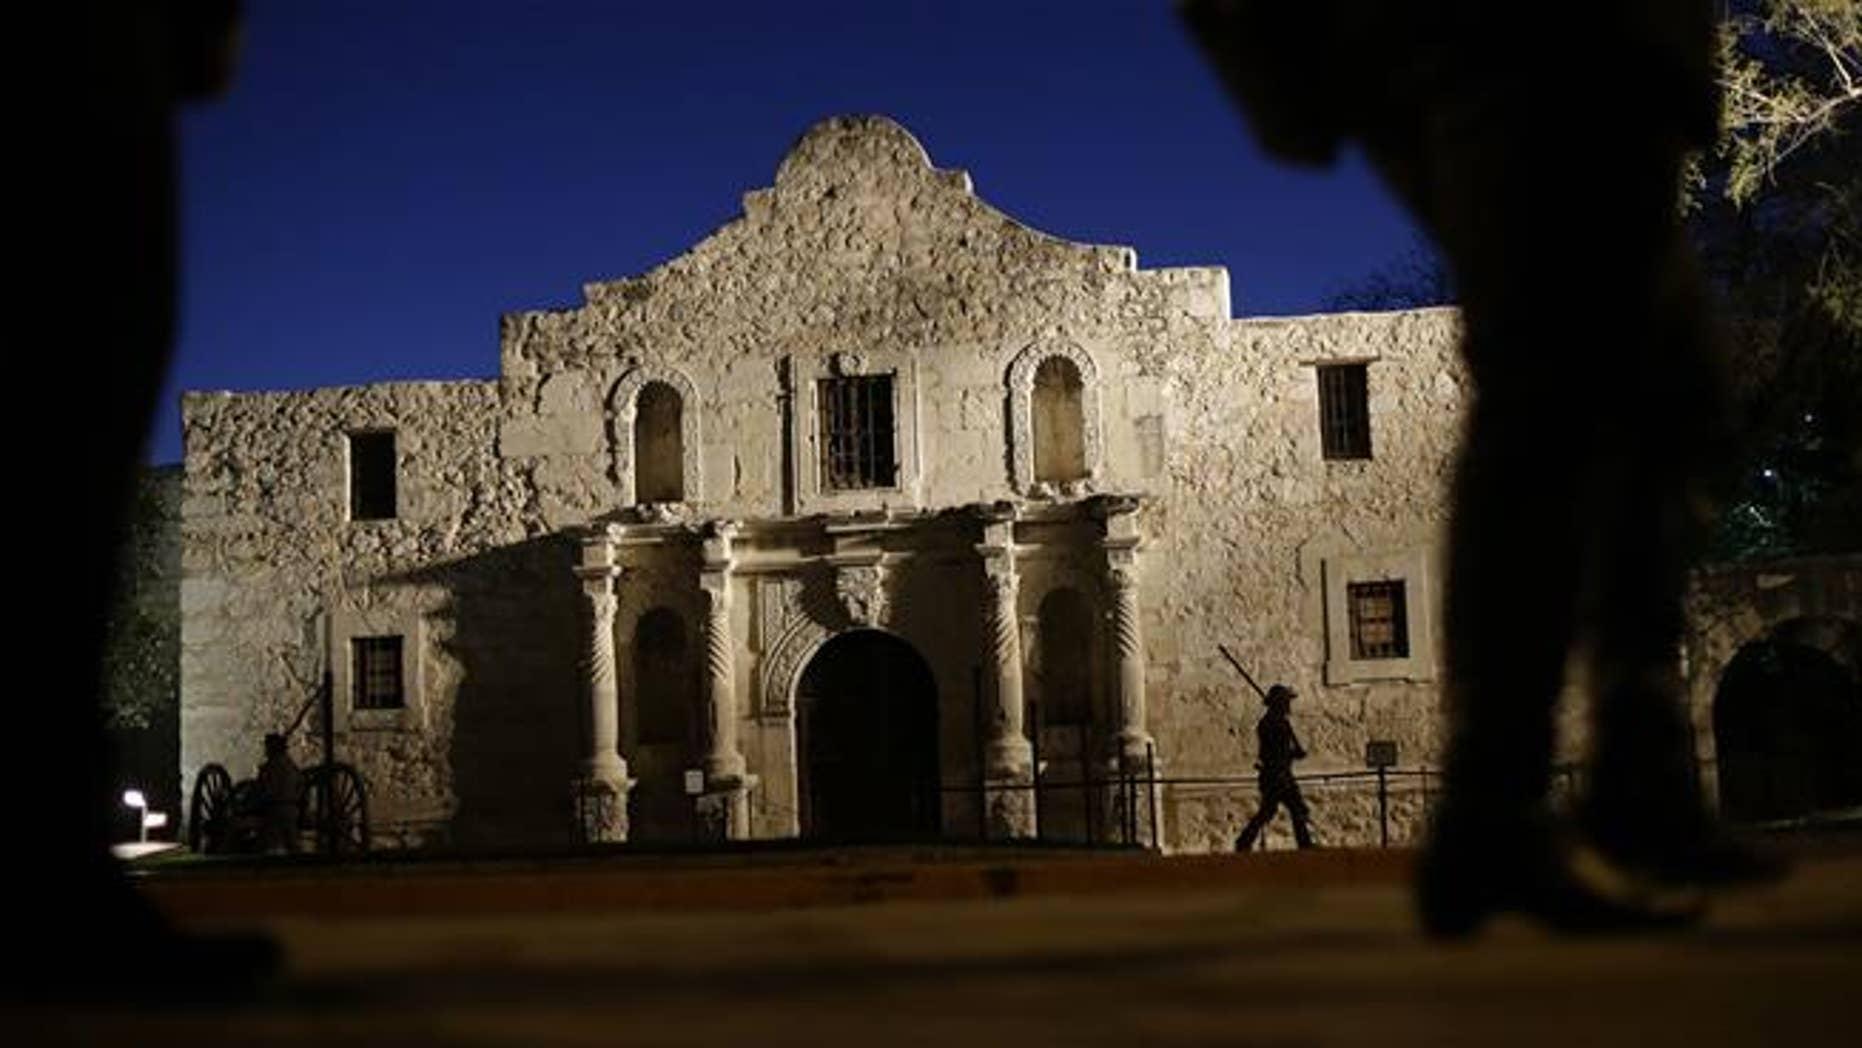 The Alamo is seen in 2013.